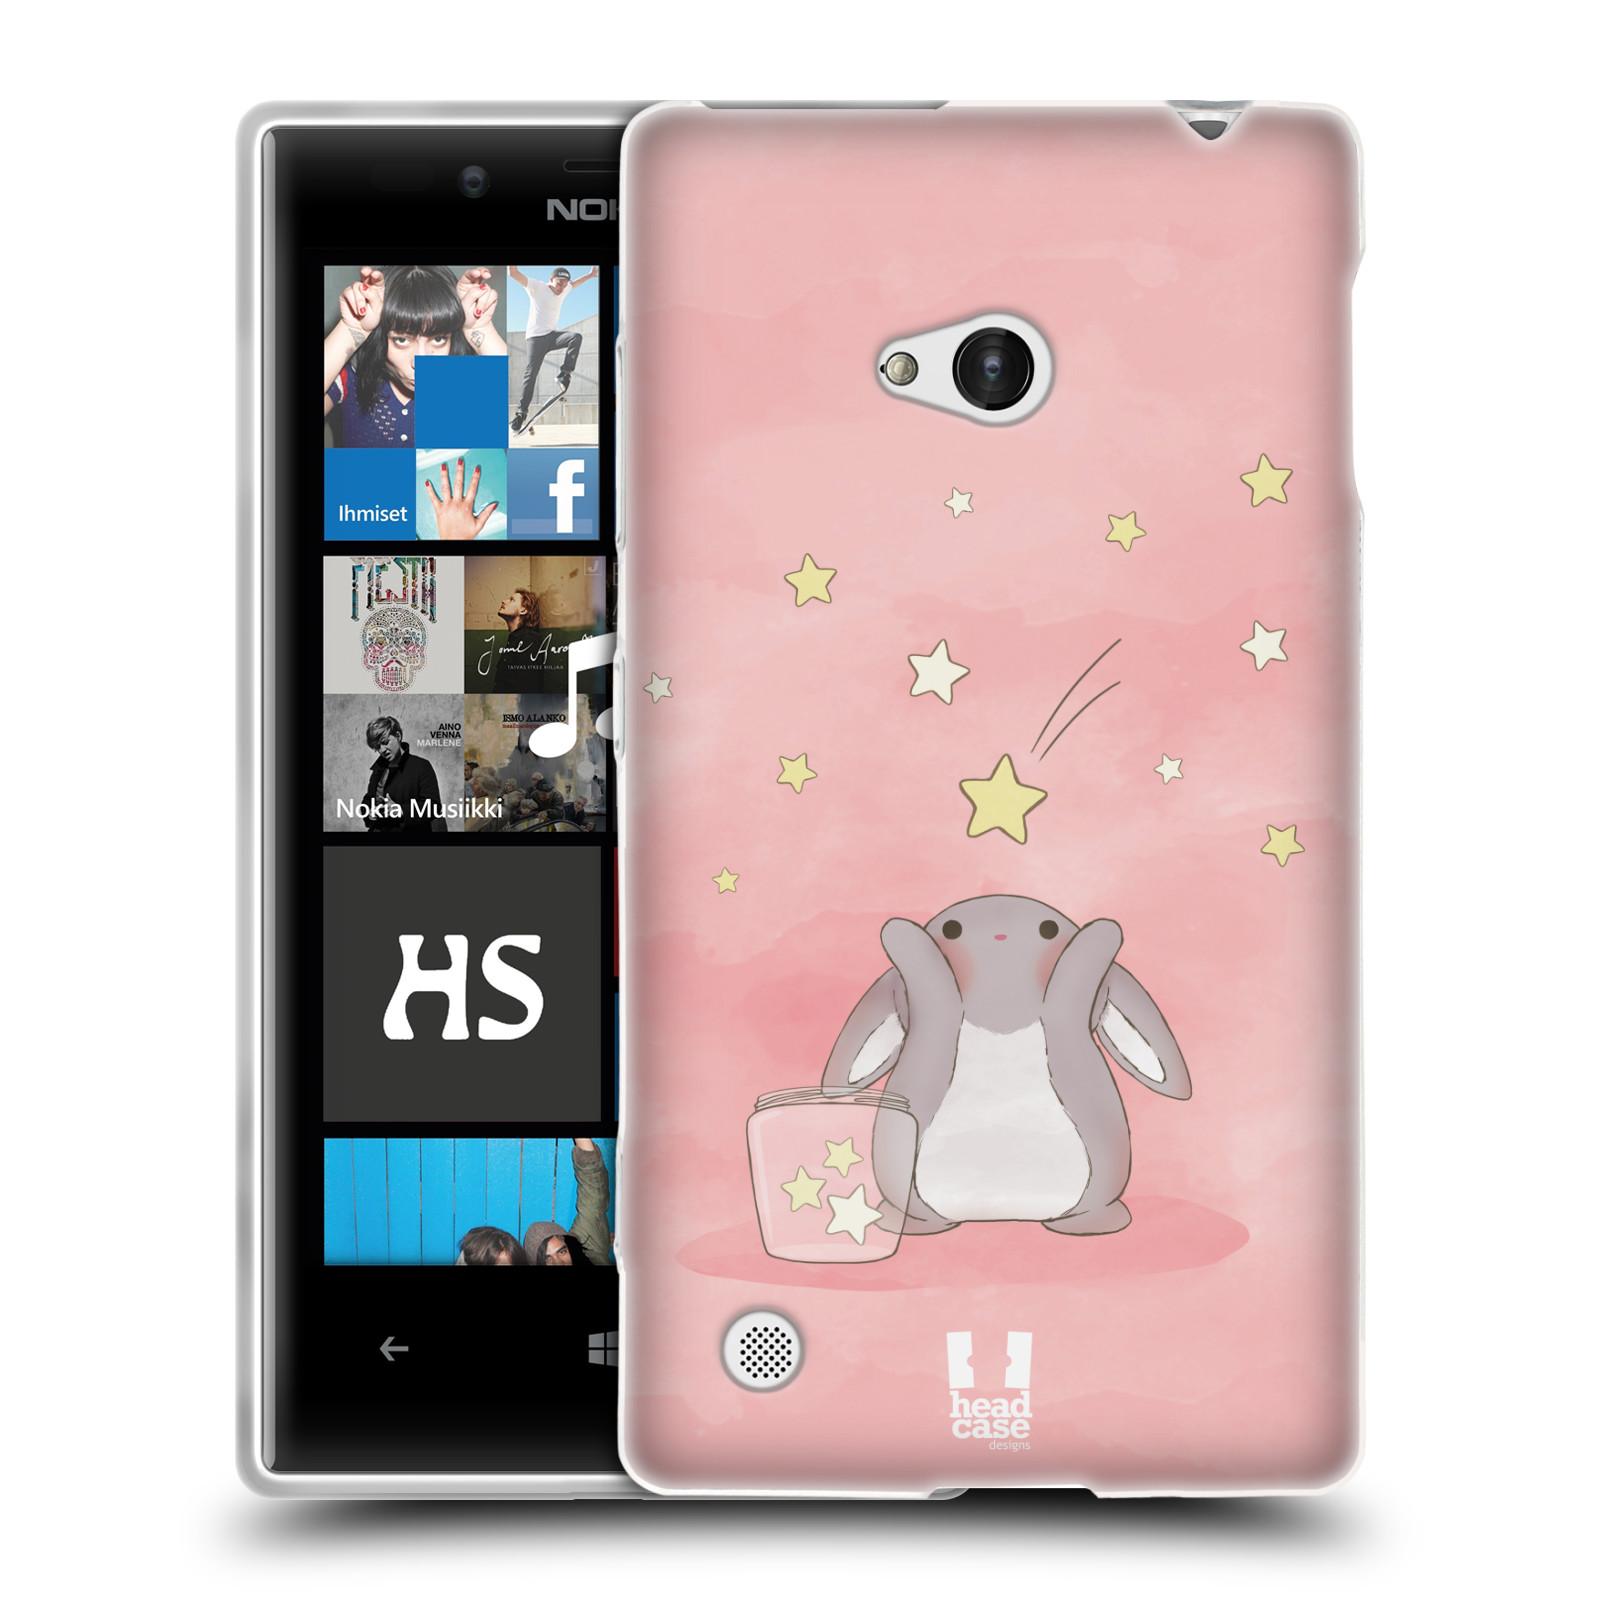 HEAD CASE silikonový obal na mobil NOKIA Lumia 720 vzor králíček a hvězdy růžová